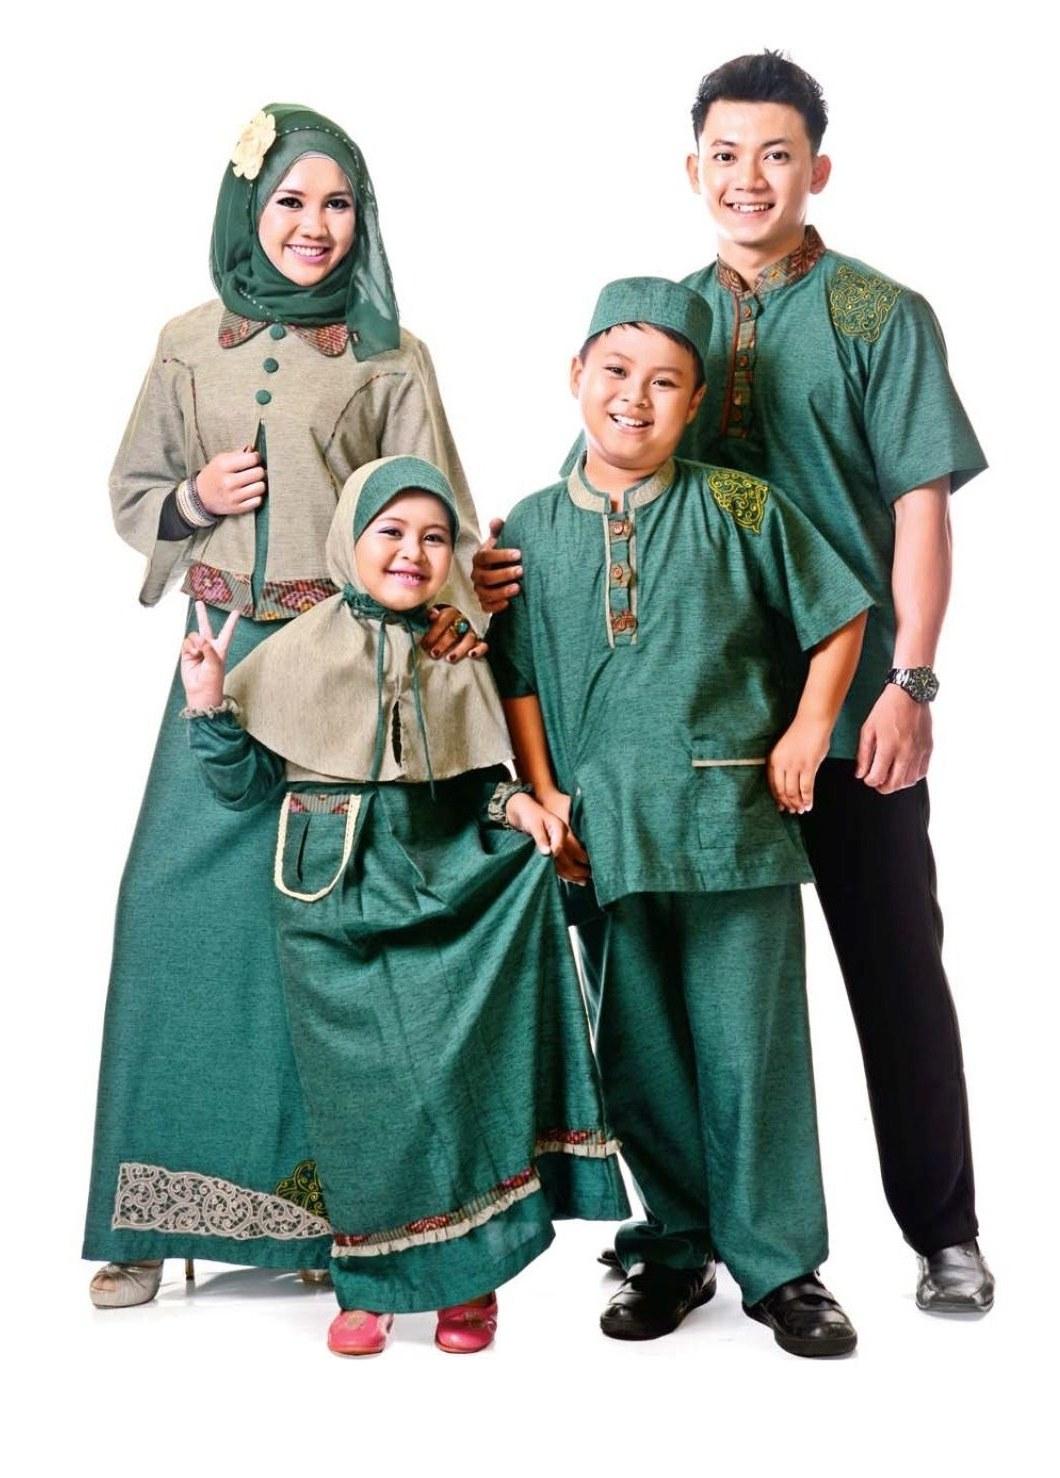 Model Inspirasi Baju Lebaran Keluarga 2019 3ldq 40 Baju Seragam Keluarga Lebaran 2020 Inspirasi Terbaru